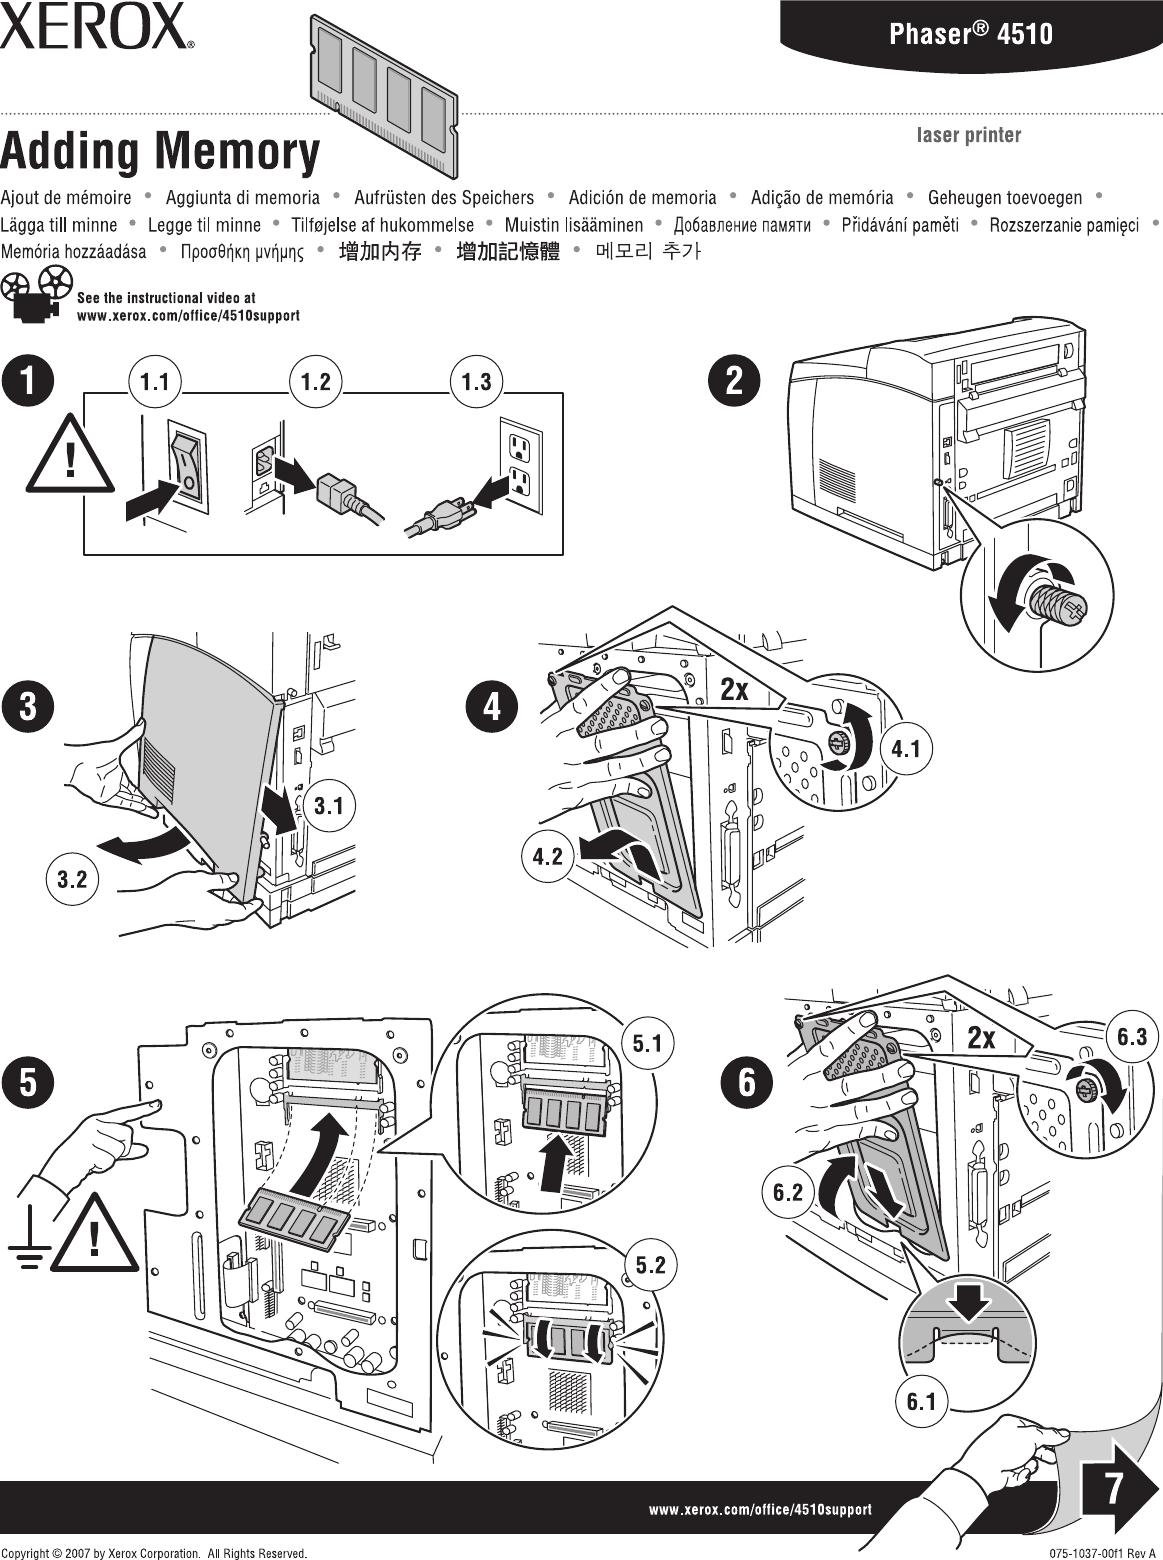 Xerox 4510 Duplex Unit, Adding Memory, Hard Drive, Flash